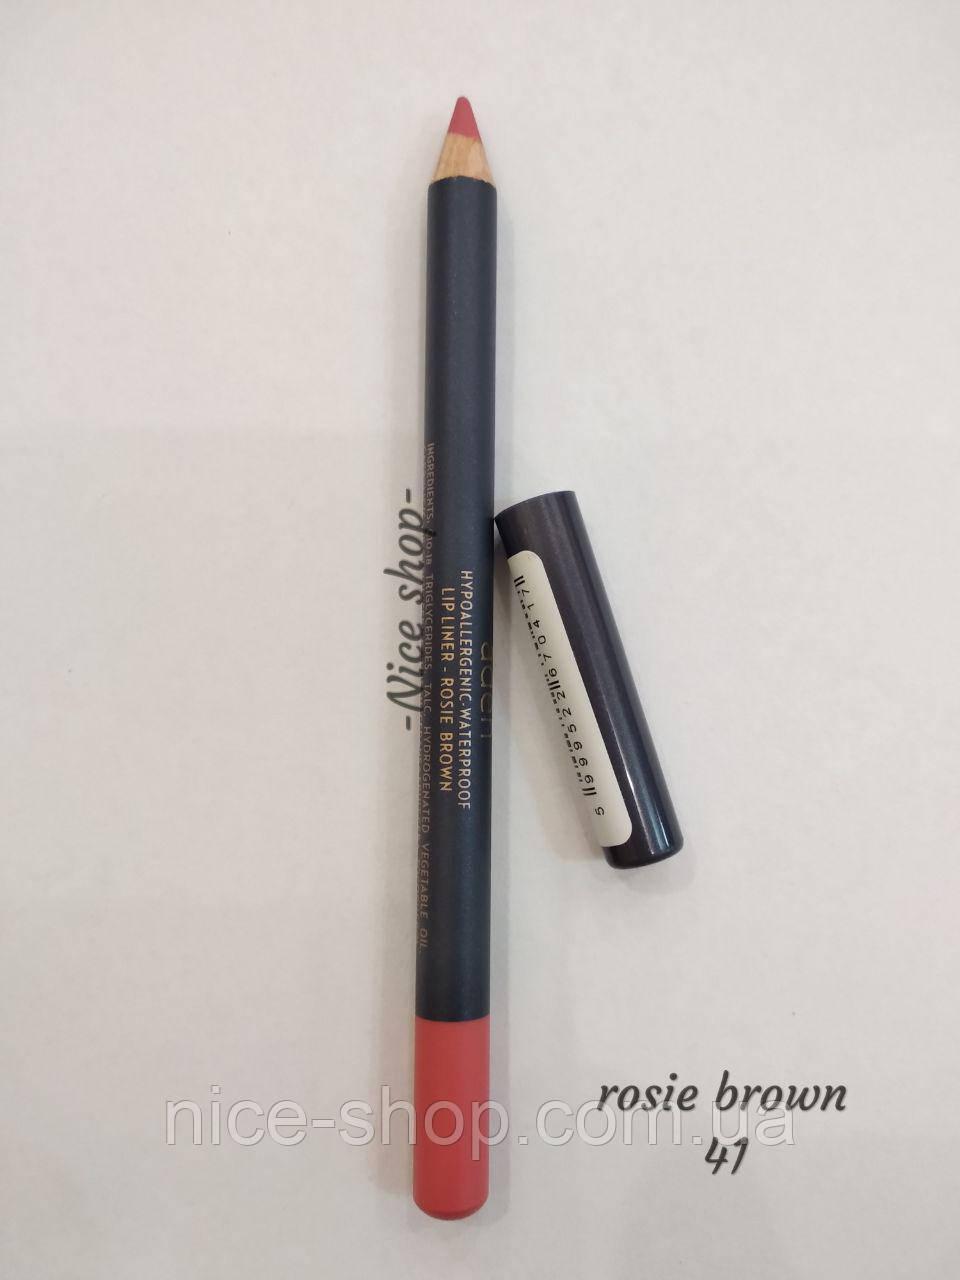 Карандаш для губ Rosie brown Lipliner Aden № 41